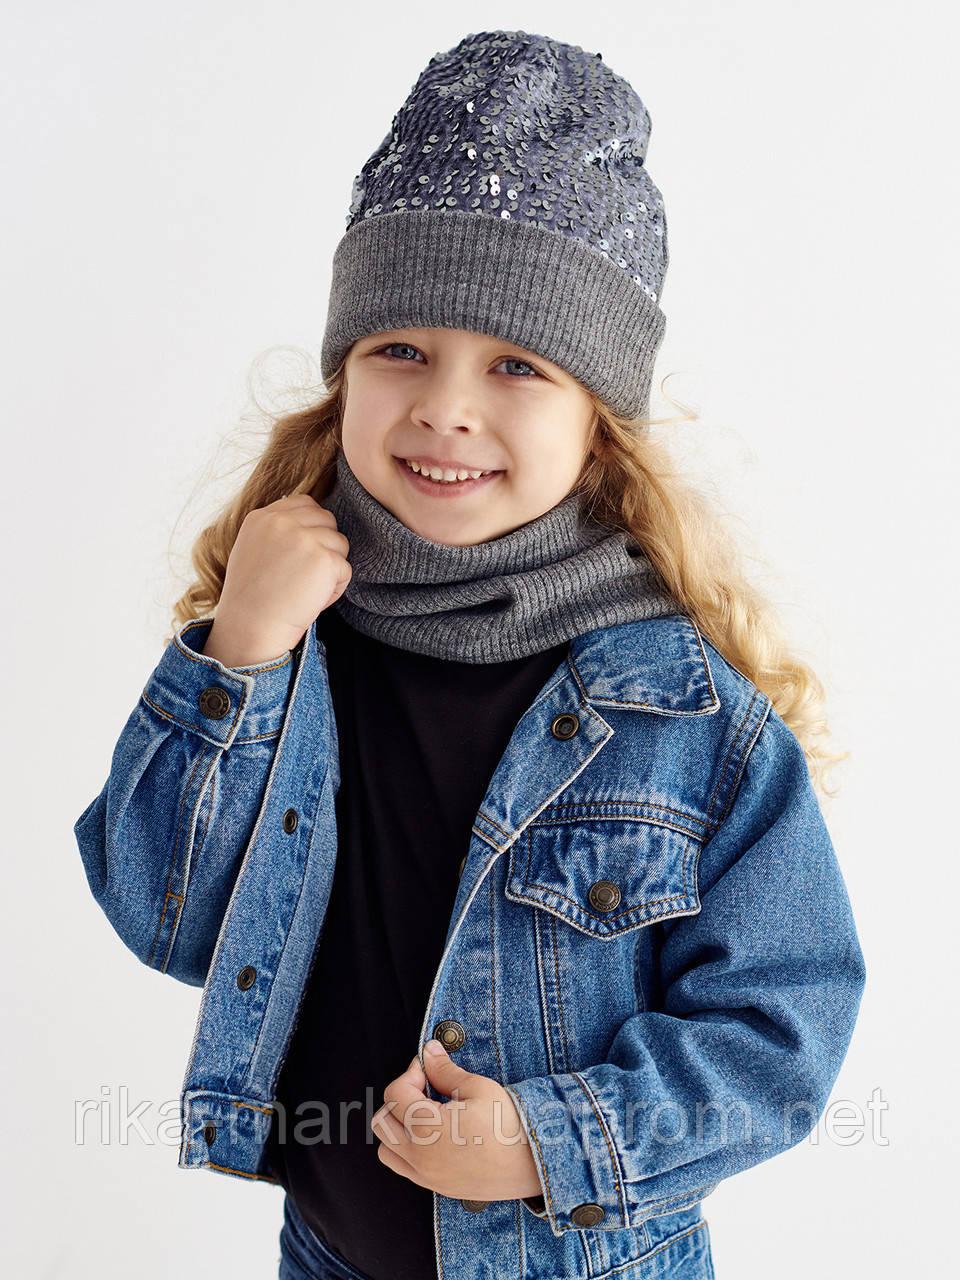 Набор для девочки (шапка и снуд)ТМ Дембохаус, арт. Амелия, возраст от 1,5 до 6 лет